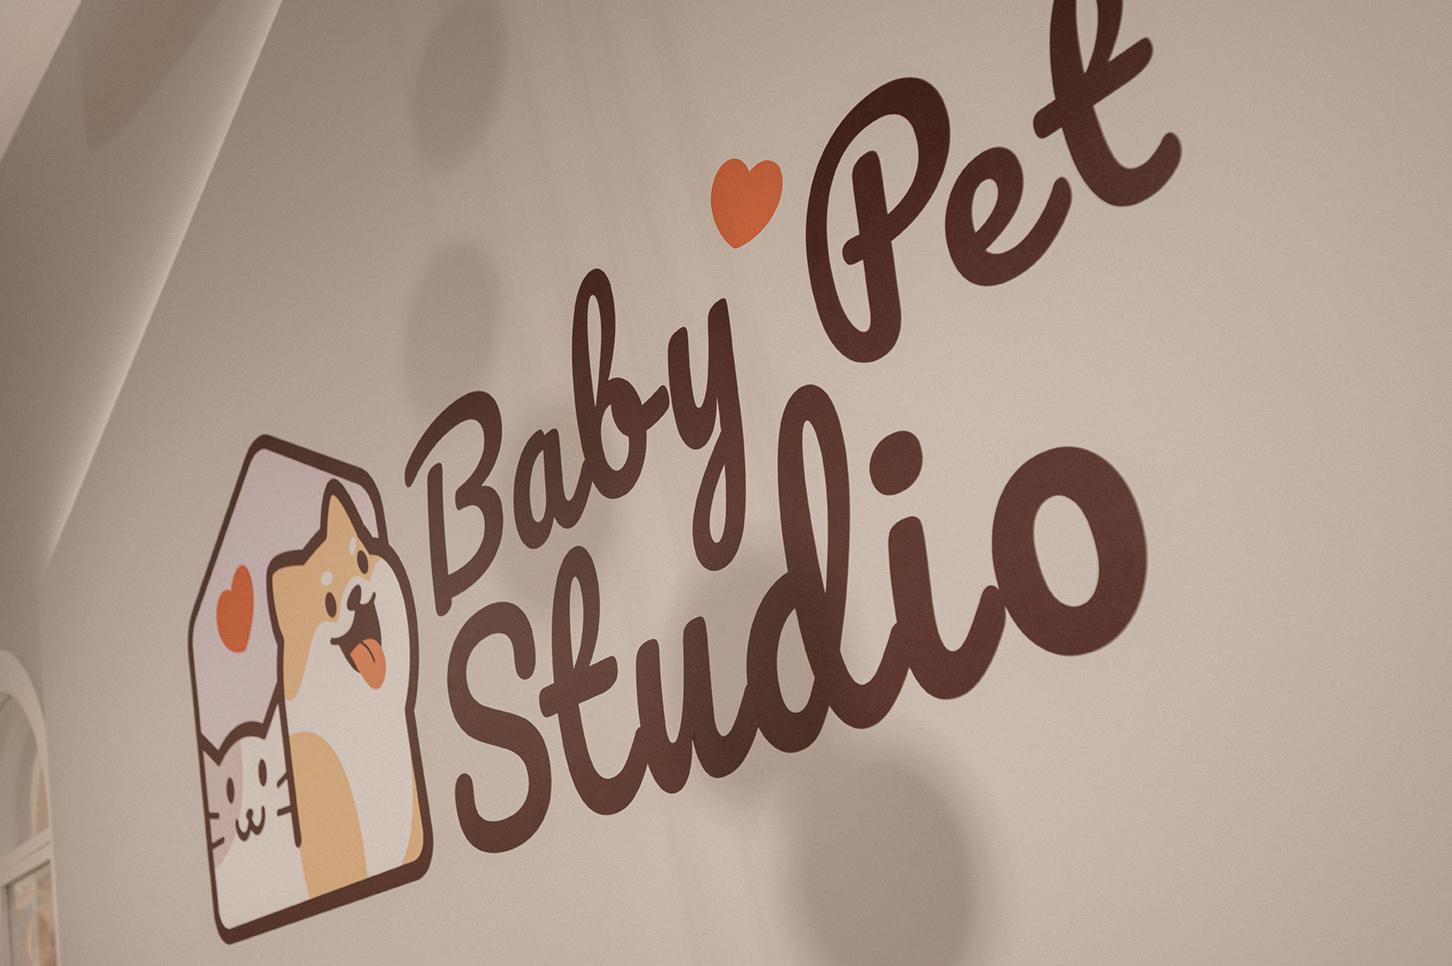 creative9_babypetstudio_1-1